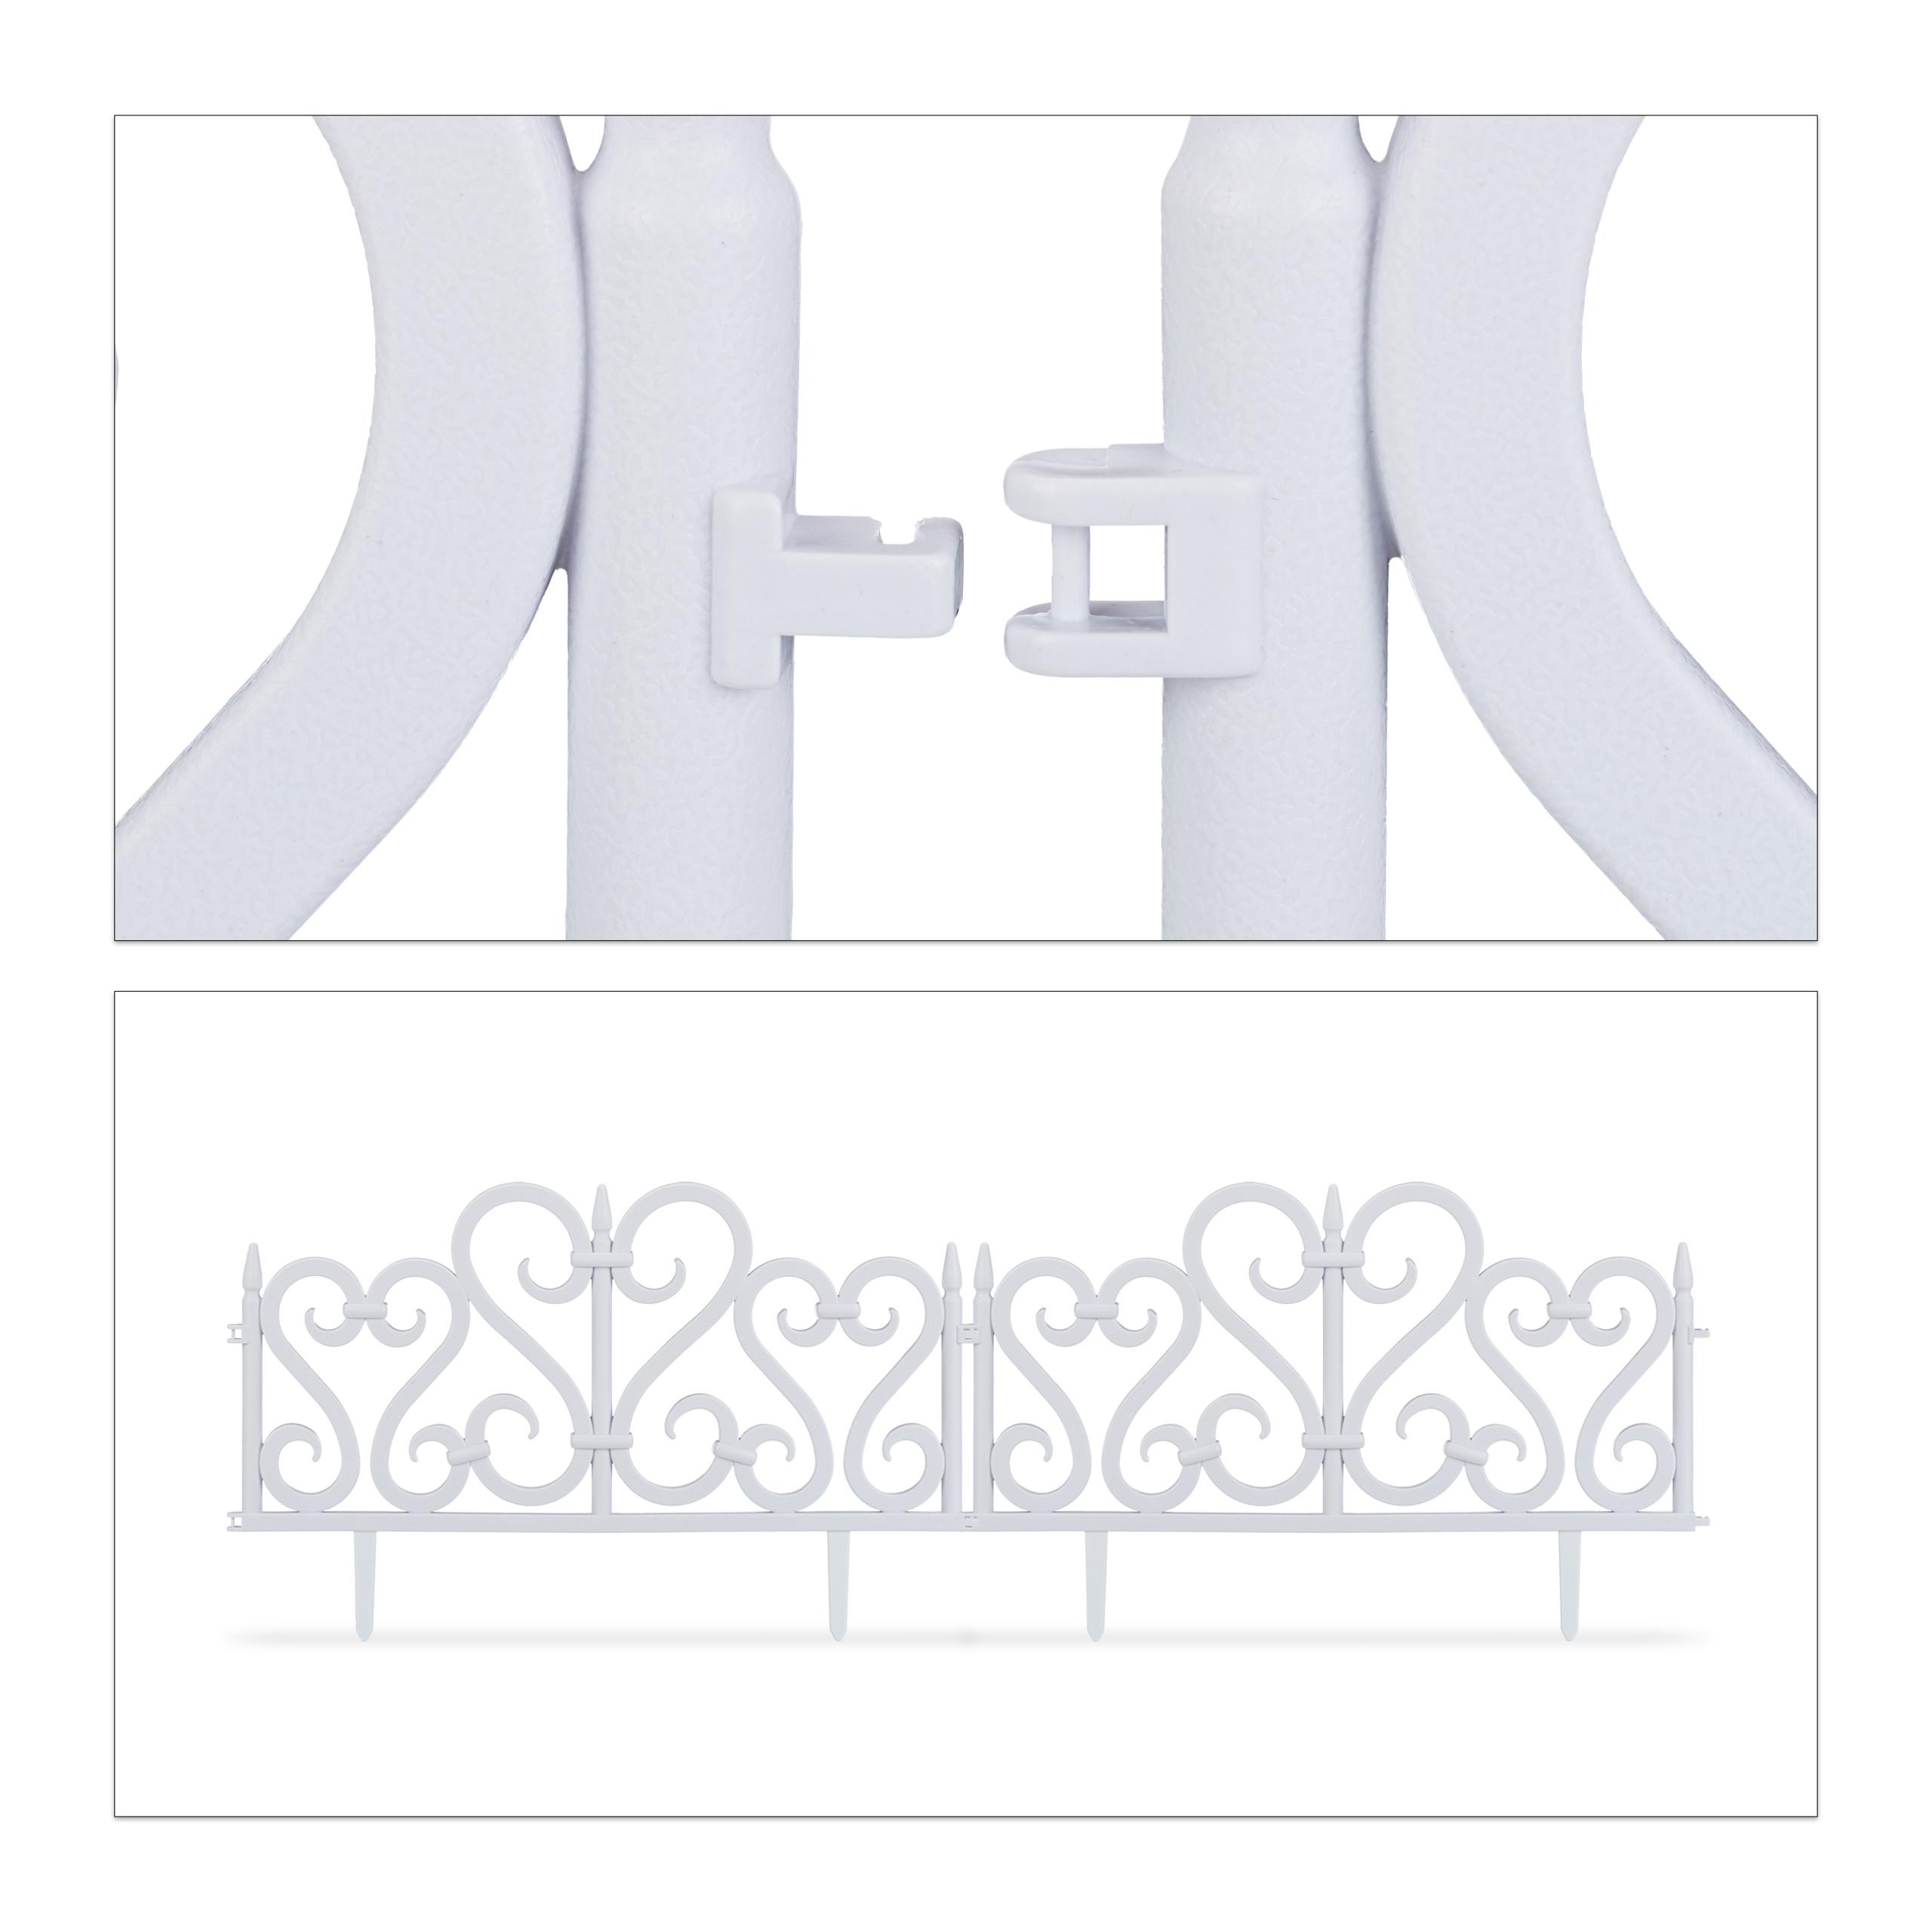 Valla-jardin-Borde-cesped-Bordillo-limitador-jardin-Set-4-separadores-cesped miniatura 7